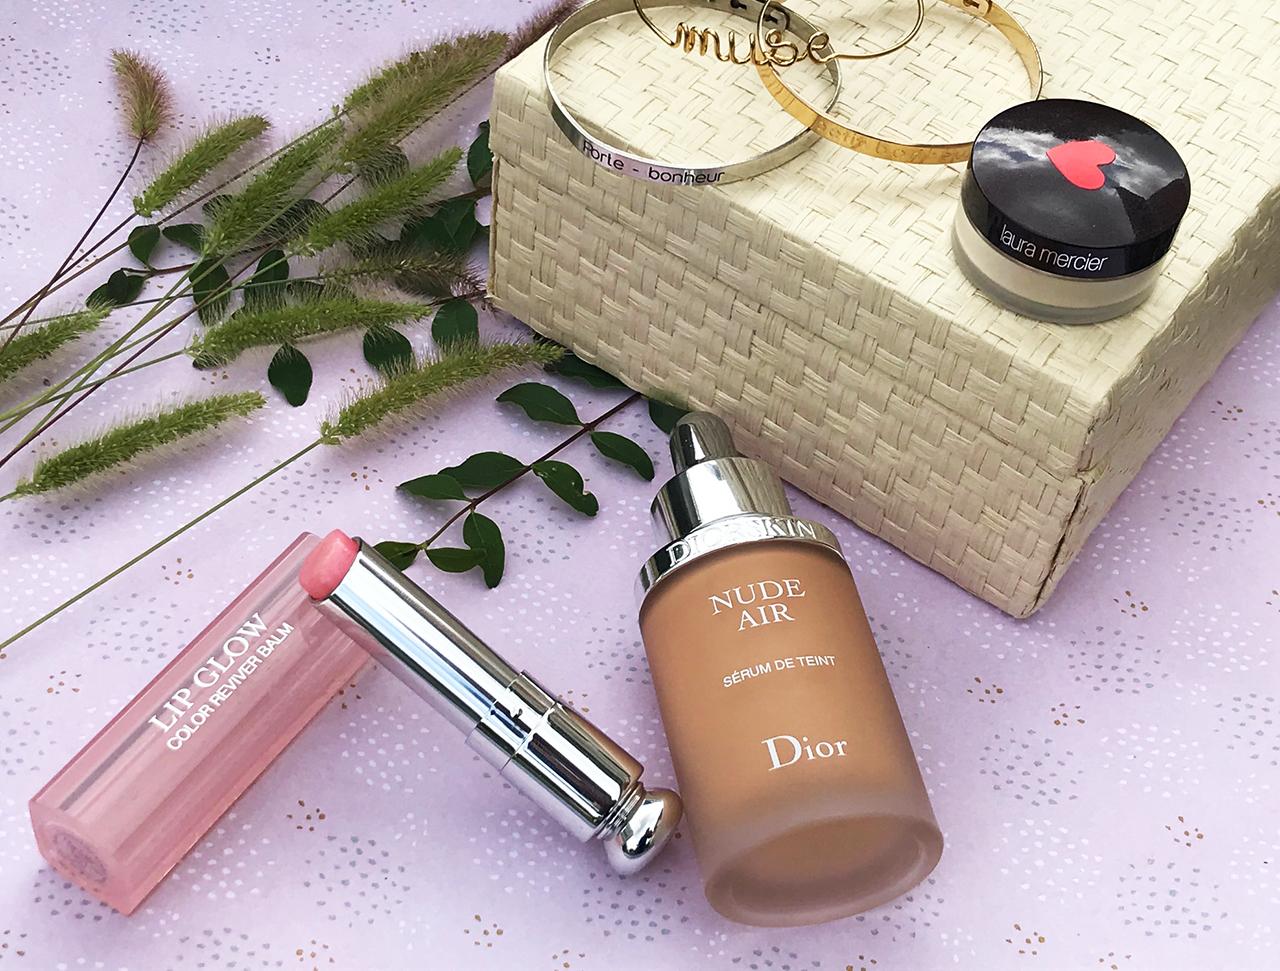 Fond de teint Dior Skin nude